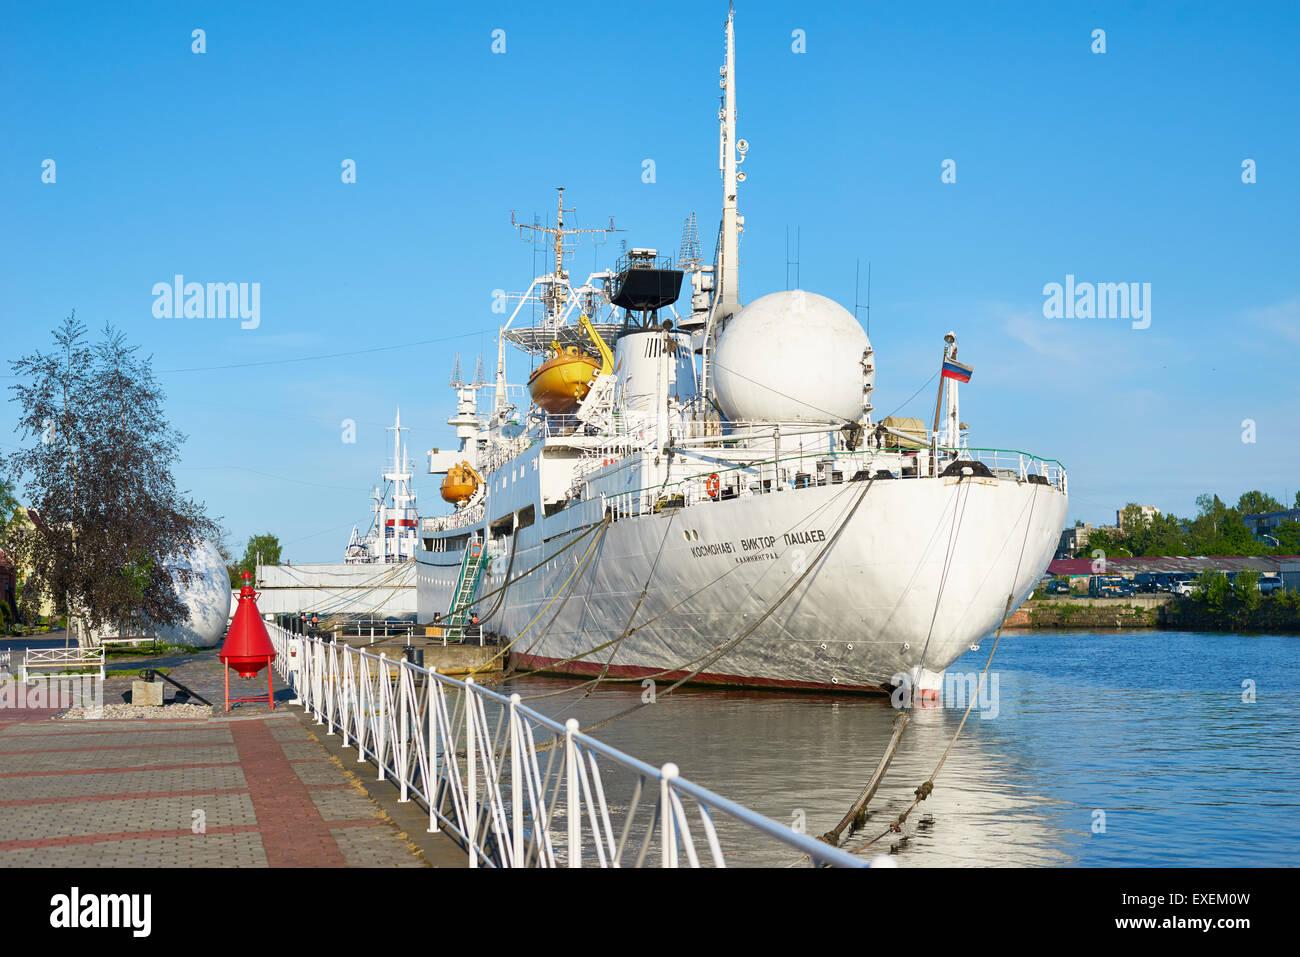 Soviet memorial dedicated to cosmonauts from kaliningrad - Kaliningrad Russia May 21 2015 Cosmonaut Viktor Patsaev Research Vessel In The Embankment Of The World Ocean Museum